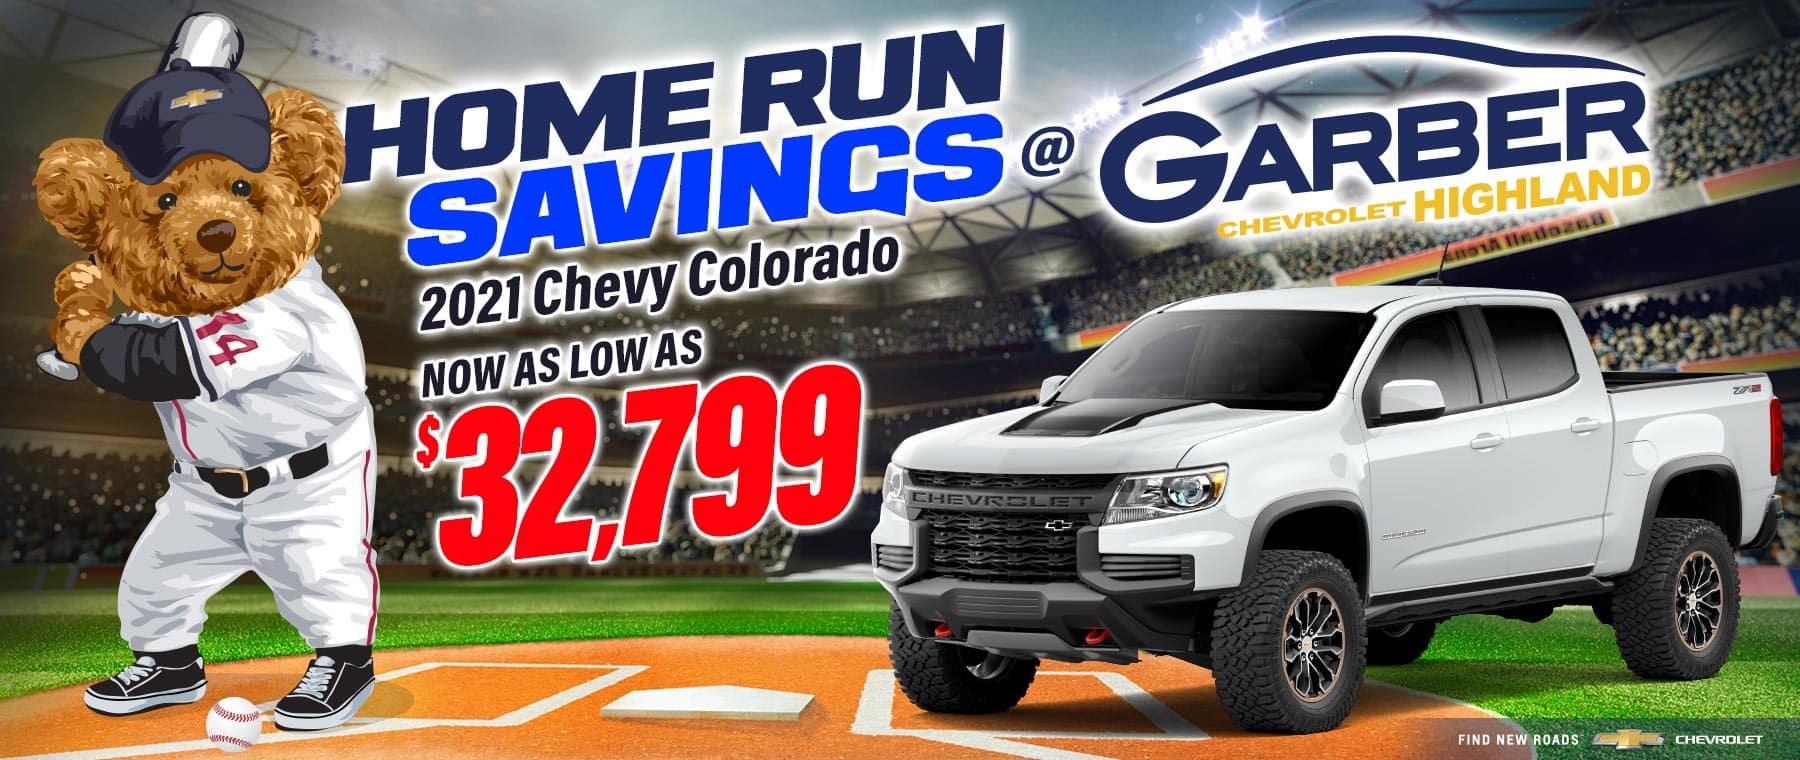 2021 Chevy Colorado - as low as $32,799